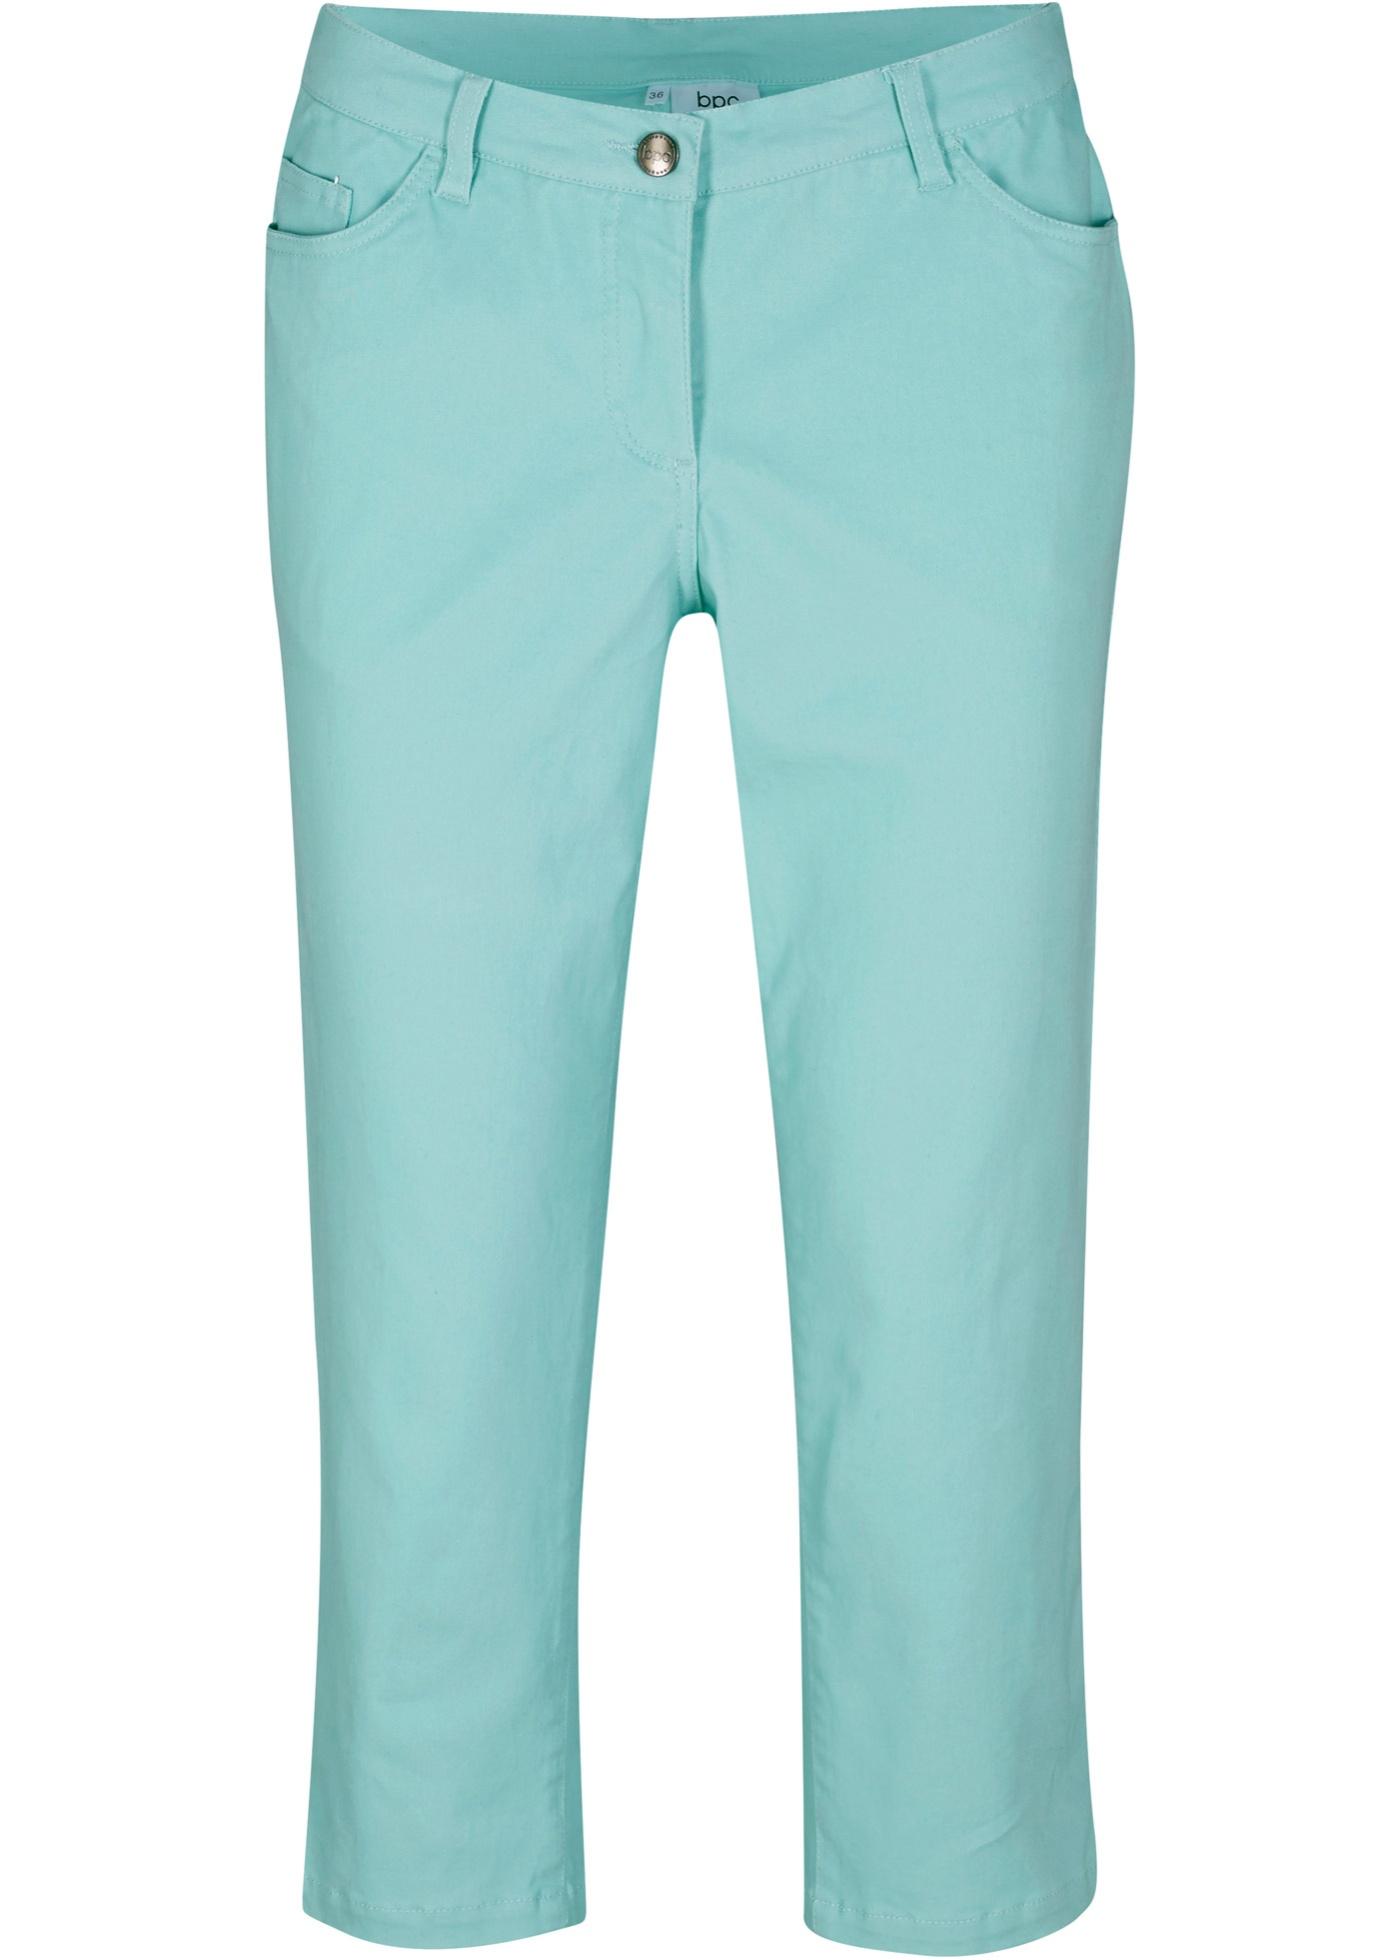 Hosen - Stretch 3 4 Hose › bonprix › blau  - Onlineshop Bonprix